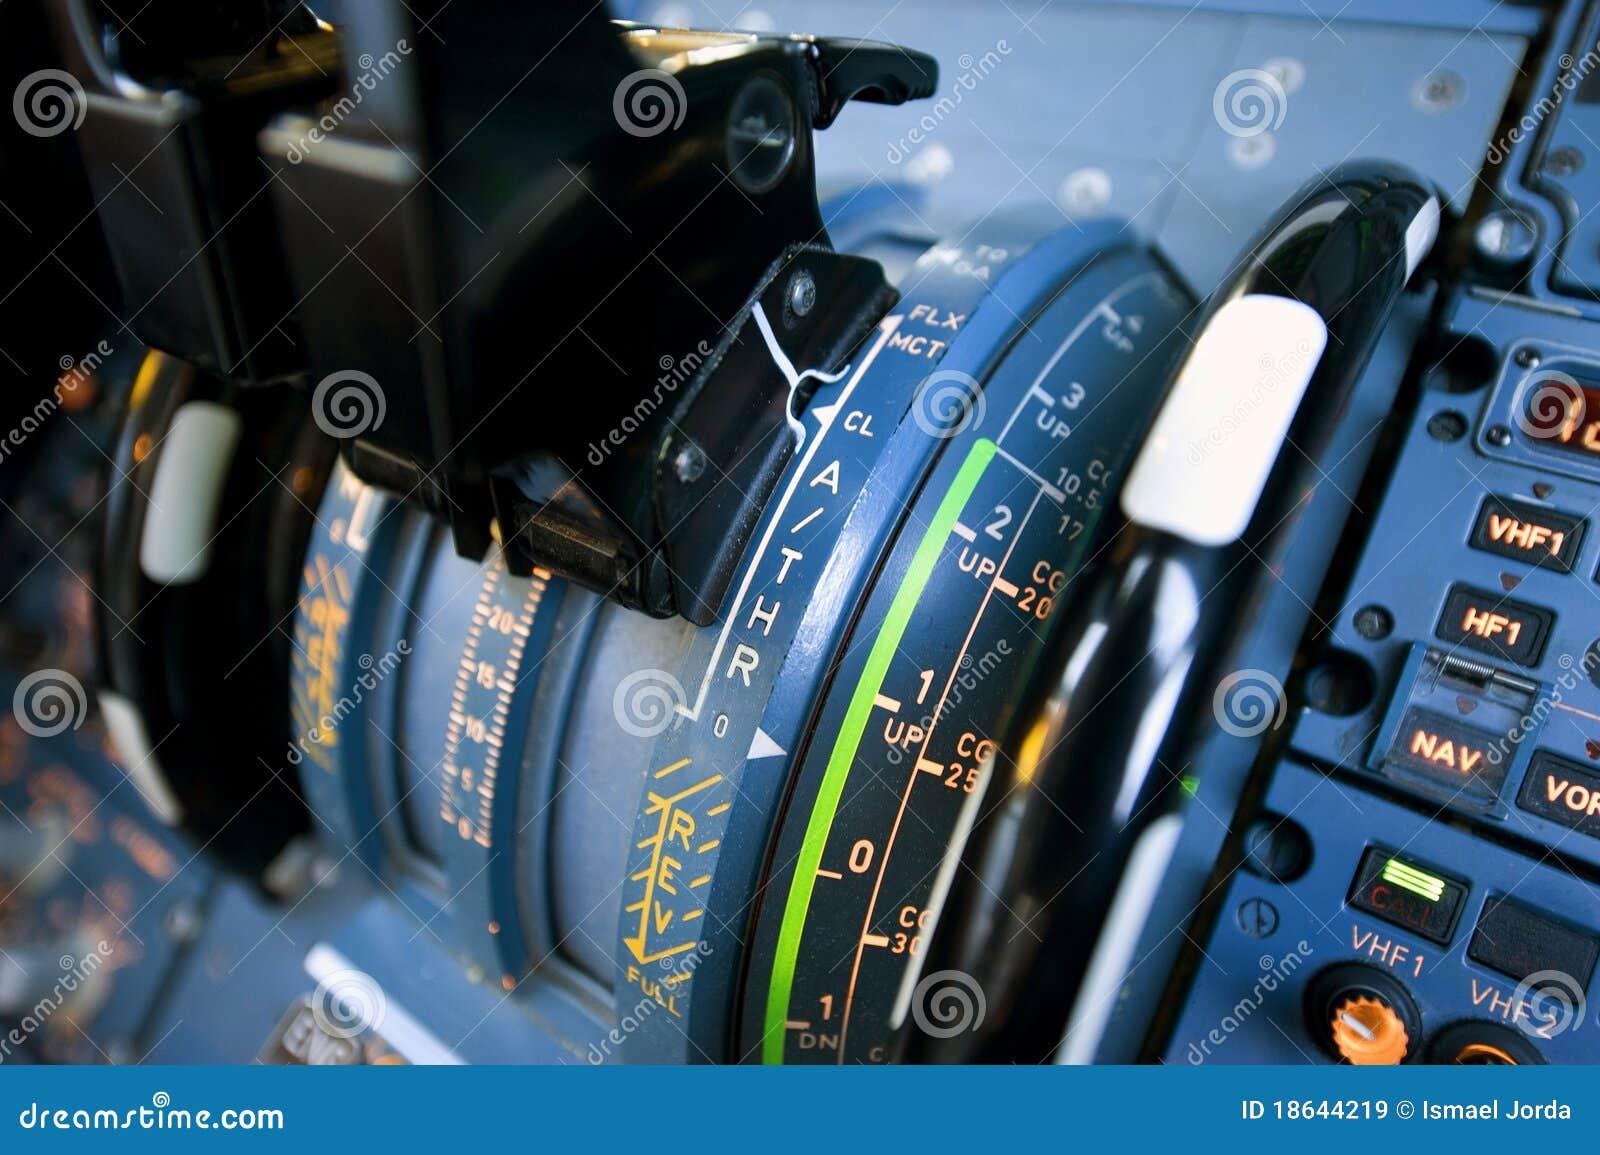 [Image: aircraft-thrust-levers-18644219.jpg]